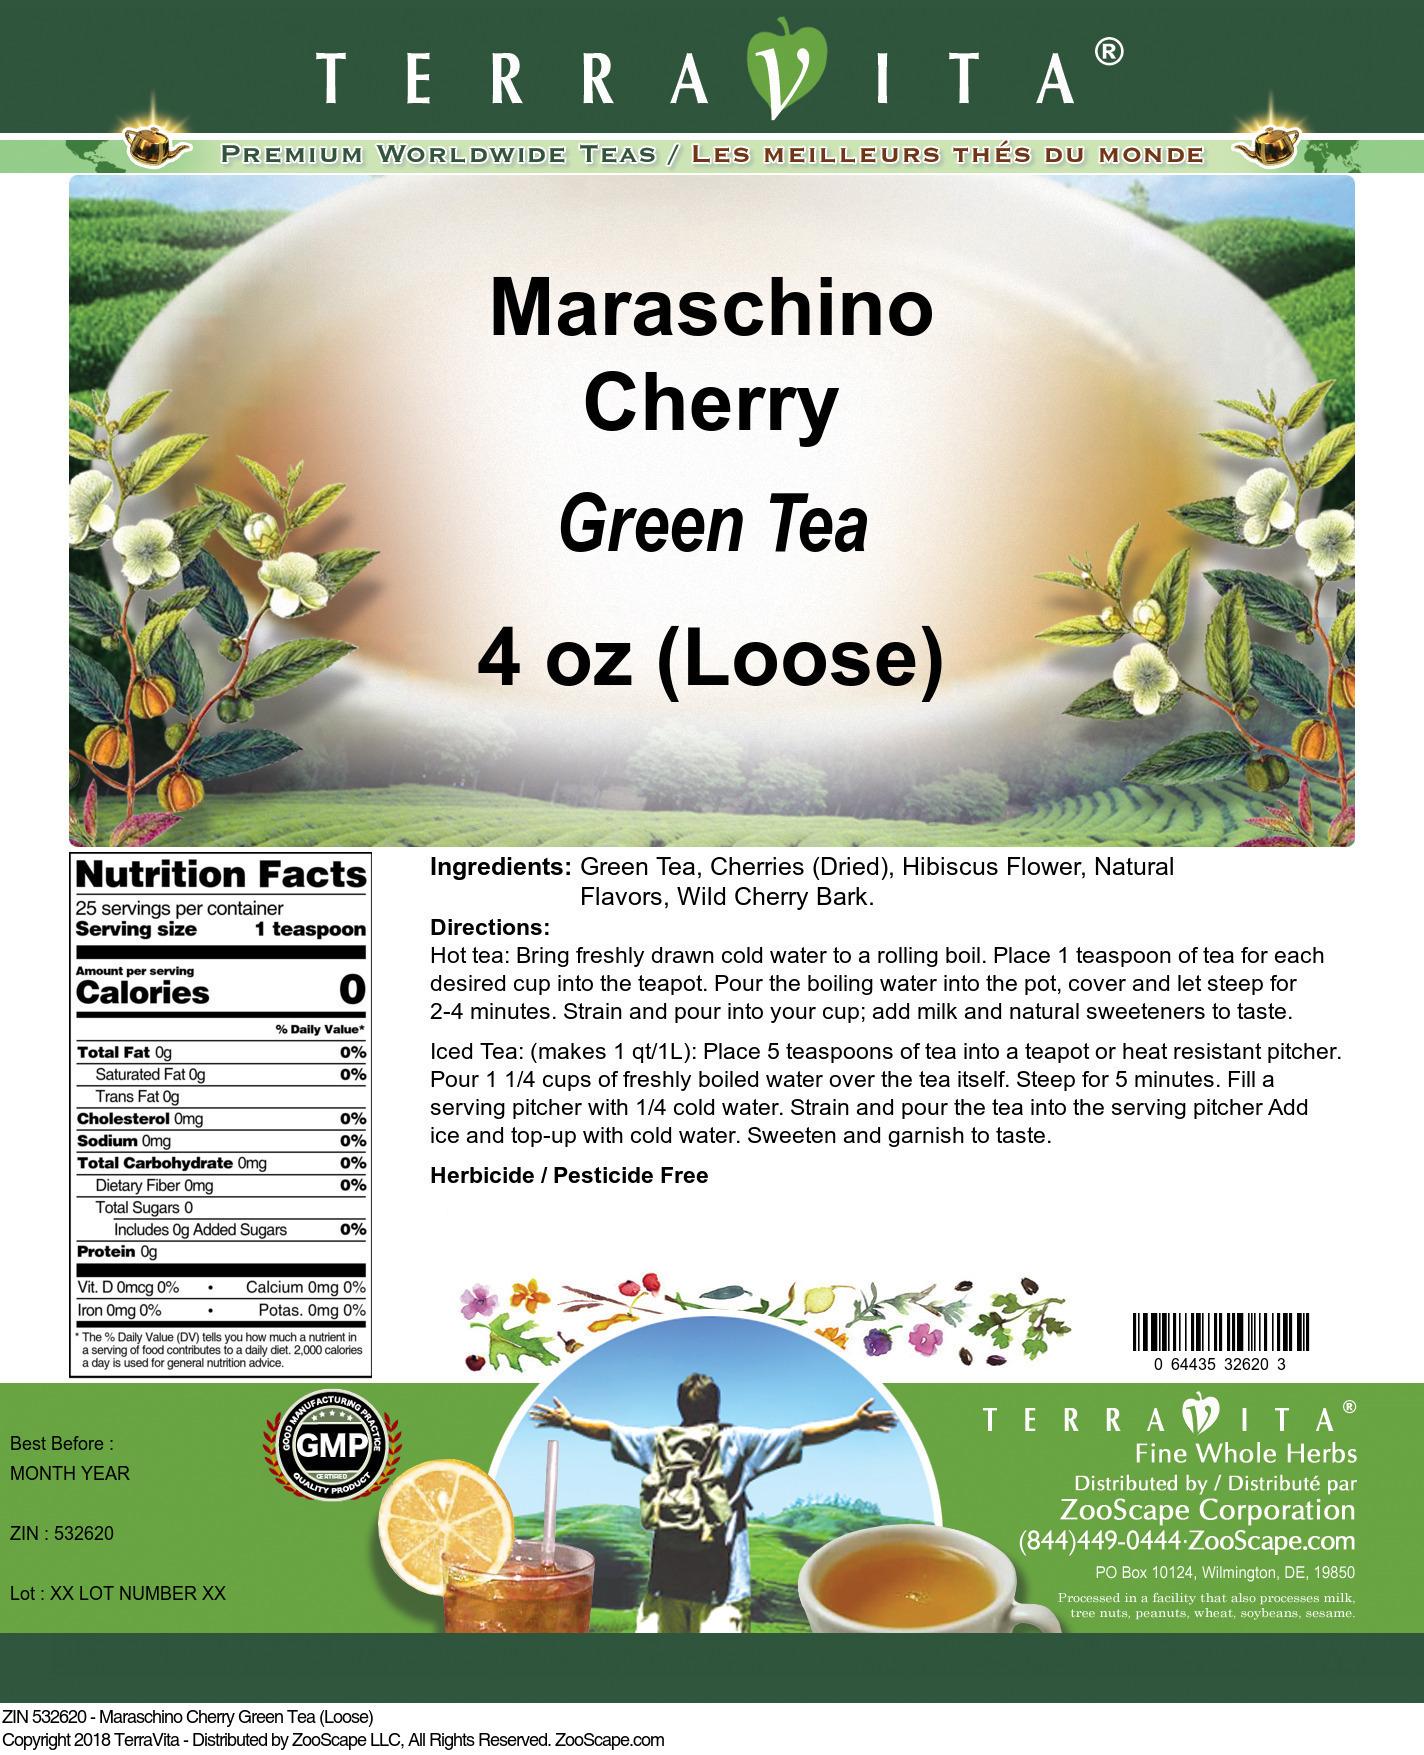 Maraschino Cherry Green Tea